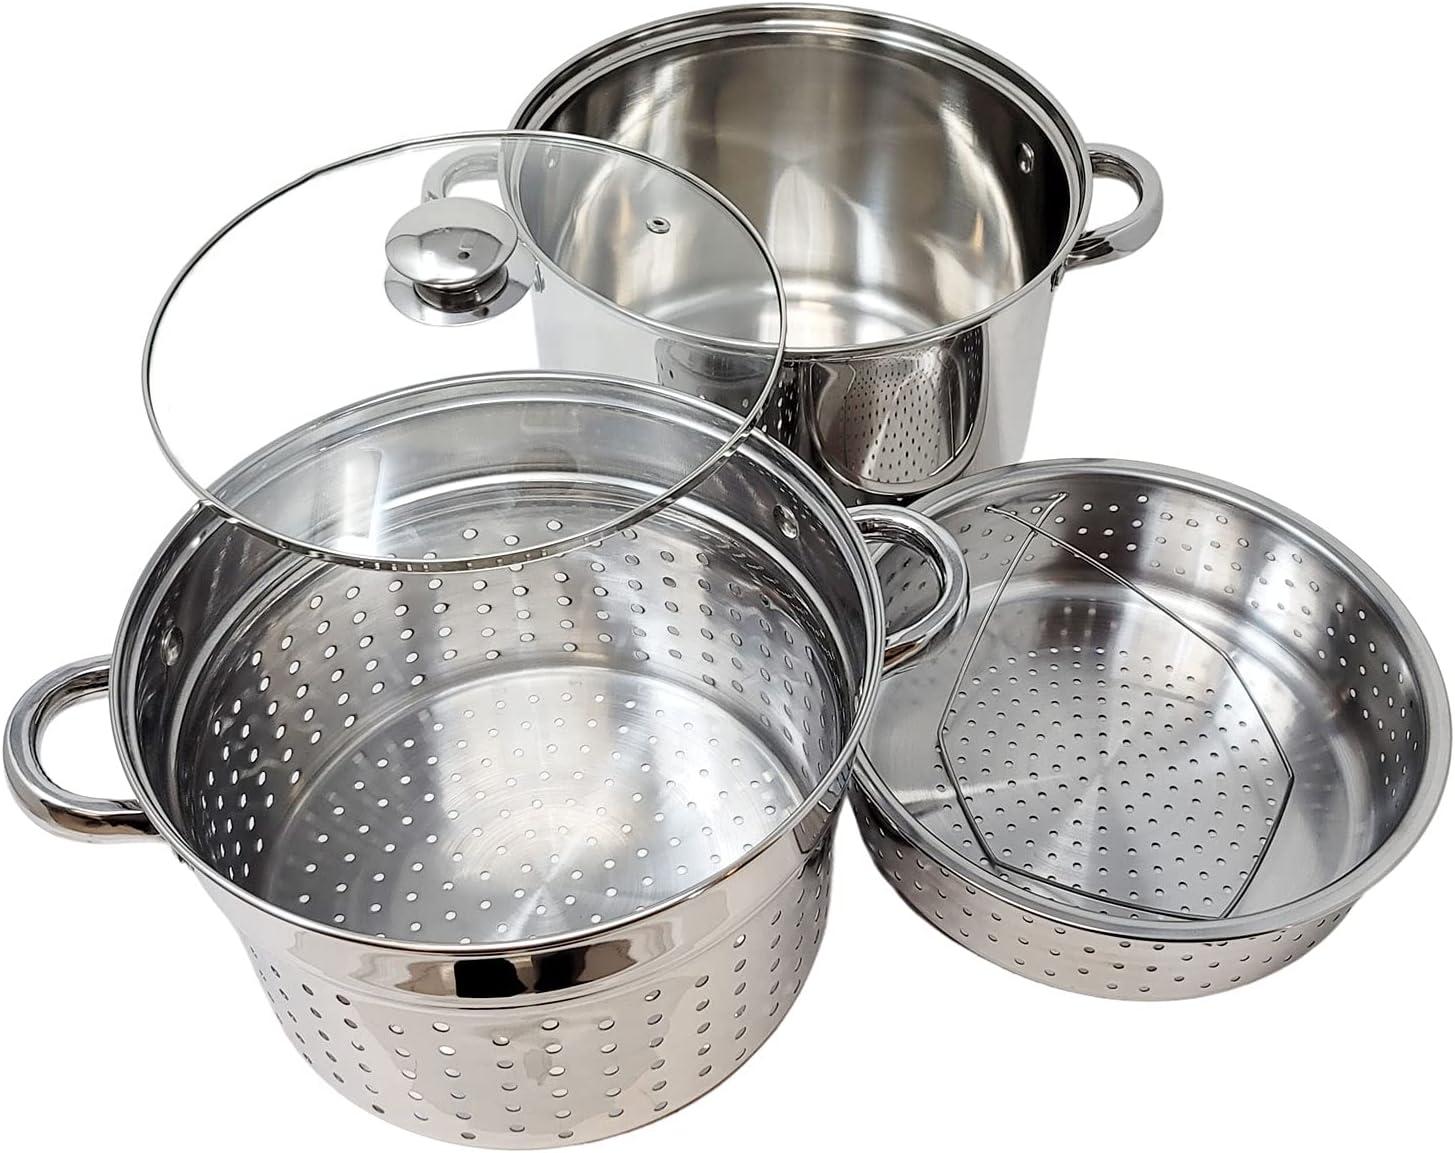 Professional Multi Purpose 4 in 1 Cooker 18/10 Stainless Steel Stock Pot, Vegetable Steamer Insert, Pasta Strainer Basket, Glass Lid Encapsulated Base - 20 Quart